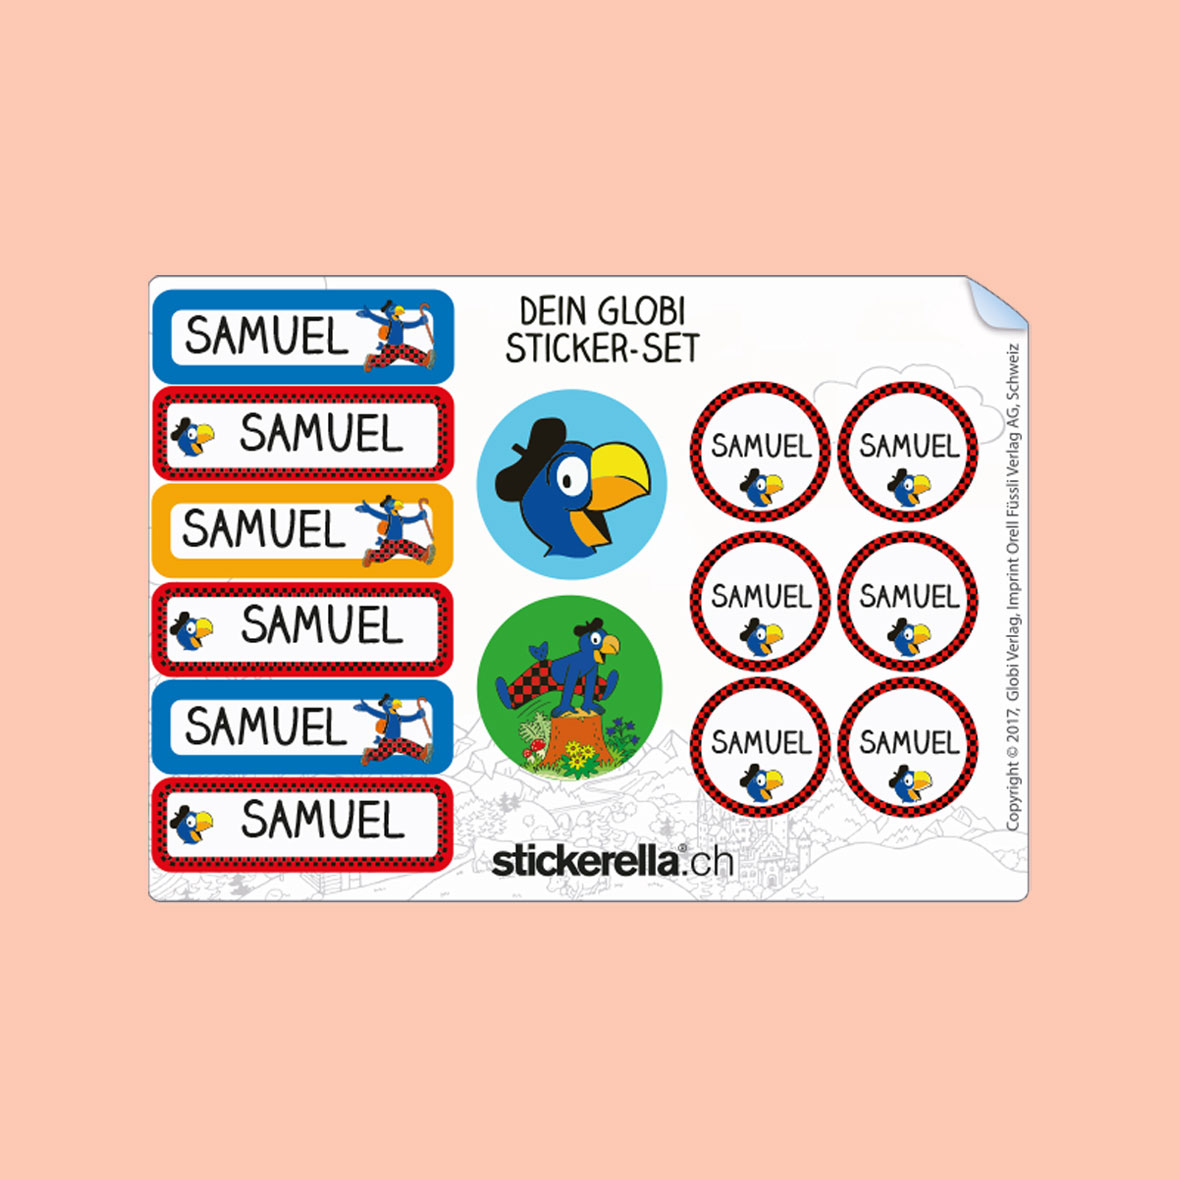 stickerella sticker set globi alpes